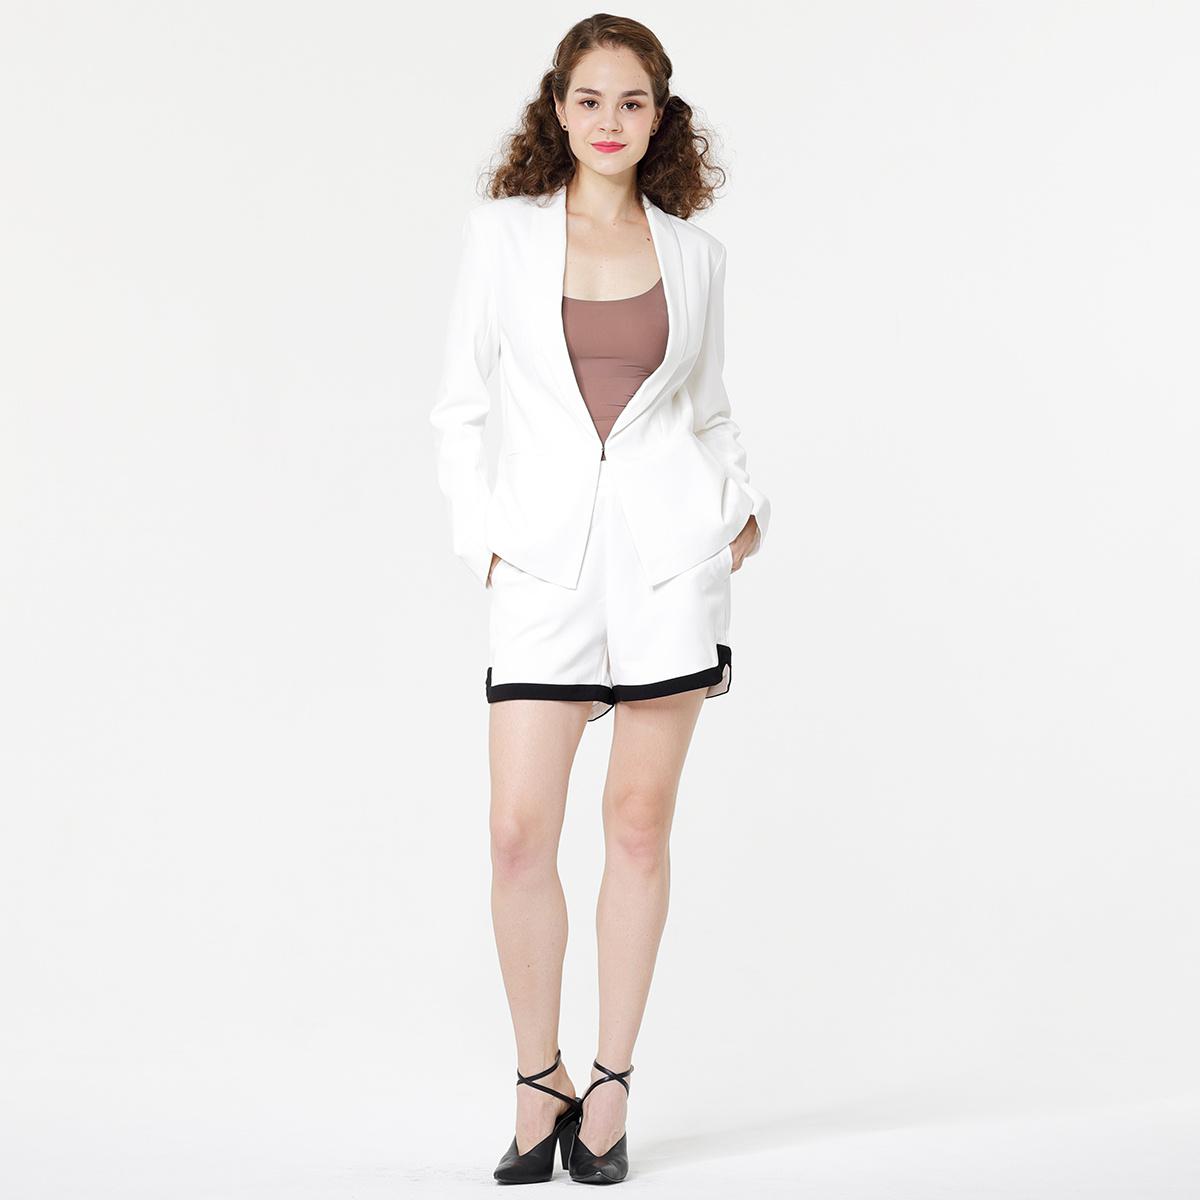 Lady's suit Blazer shorts